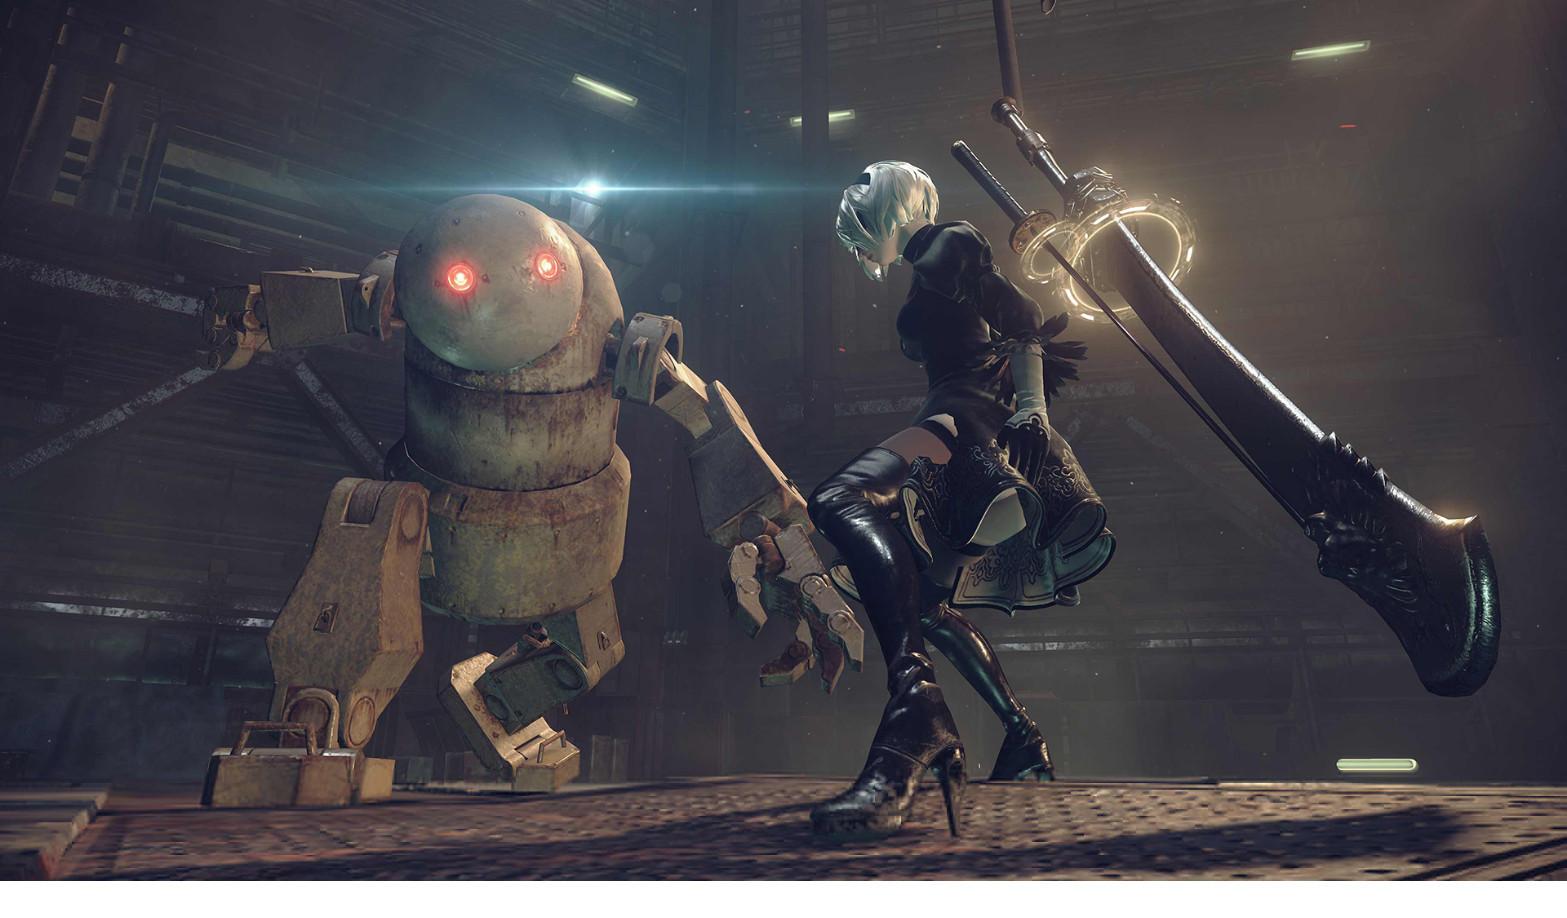 SE表示《尼尔:机械纪元》steam版不和主机版同步发行